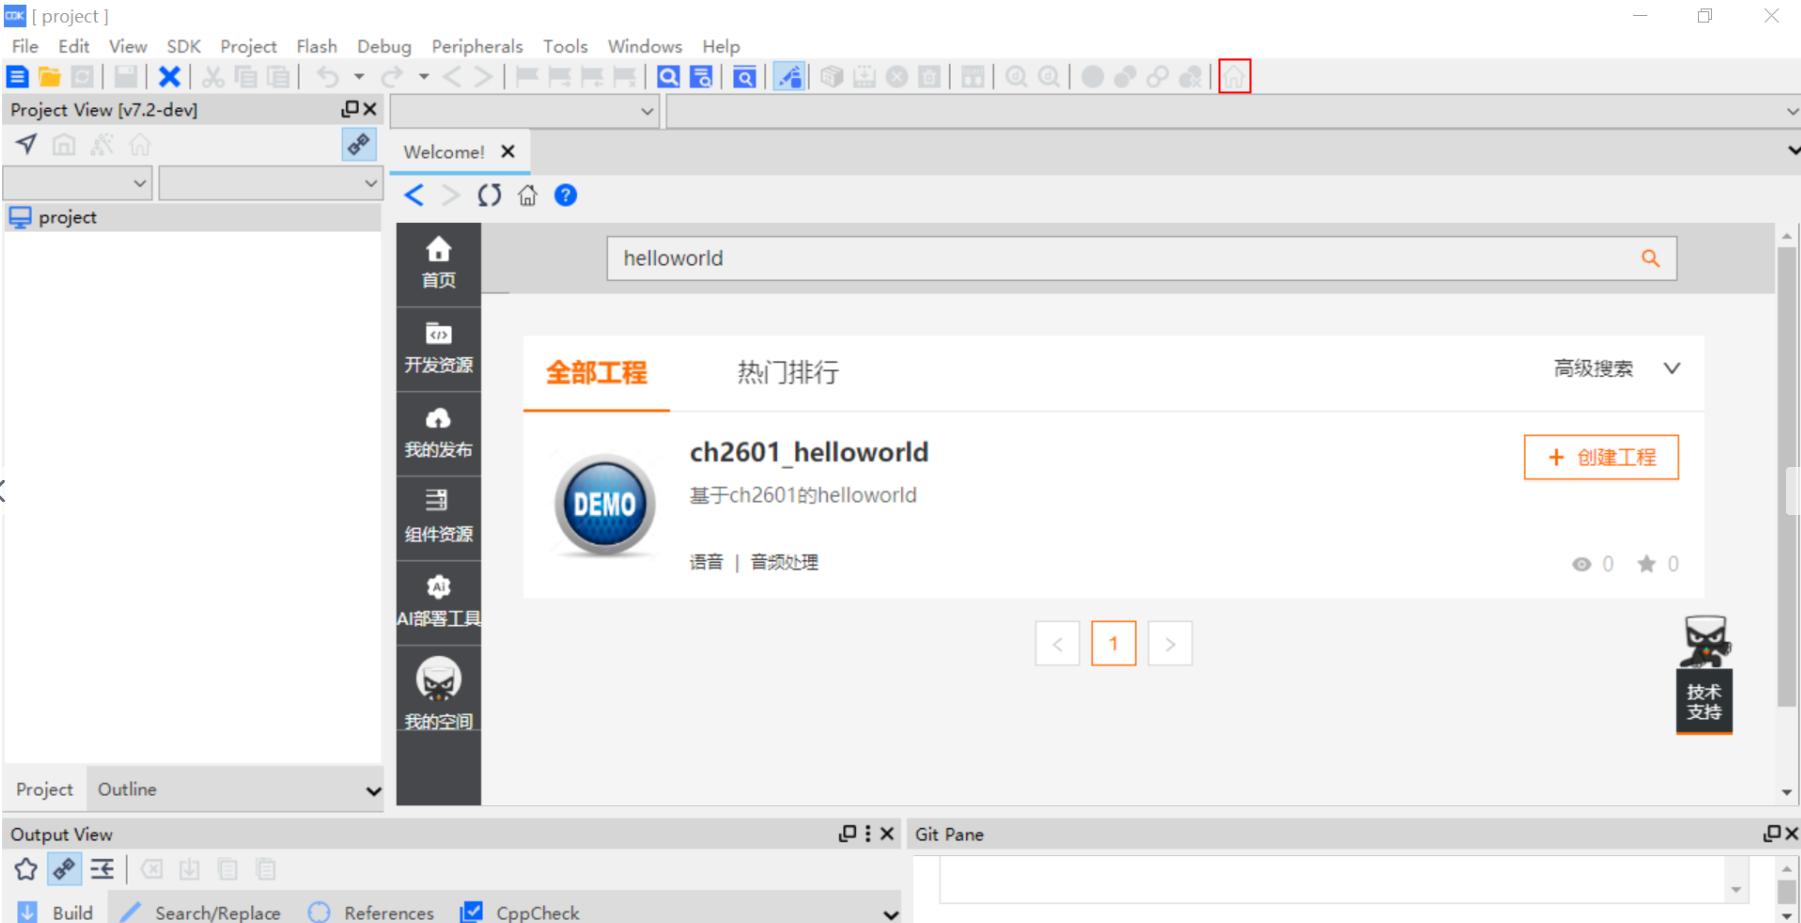 https://occ-oss-prod.oss-cn-hangzhou.aliyuncs.com/userFiles/3677281069608665088/postdetail/1618321614735/998a66aedb5c044e0fdf8da01be51874.png